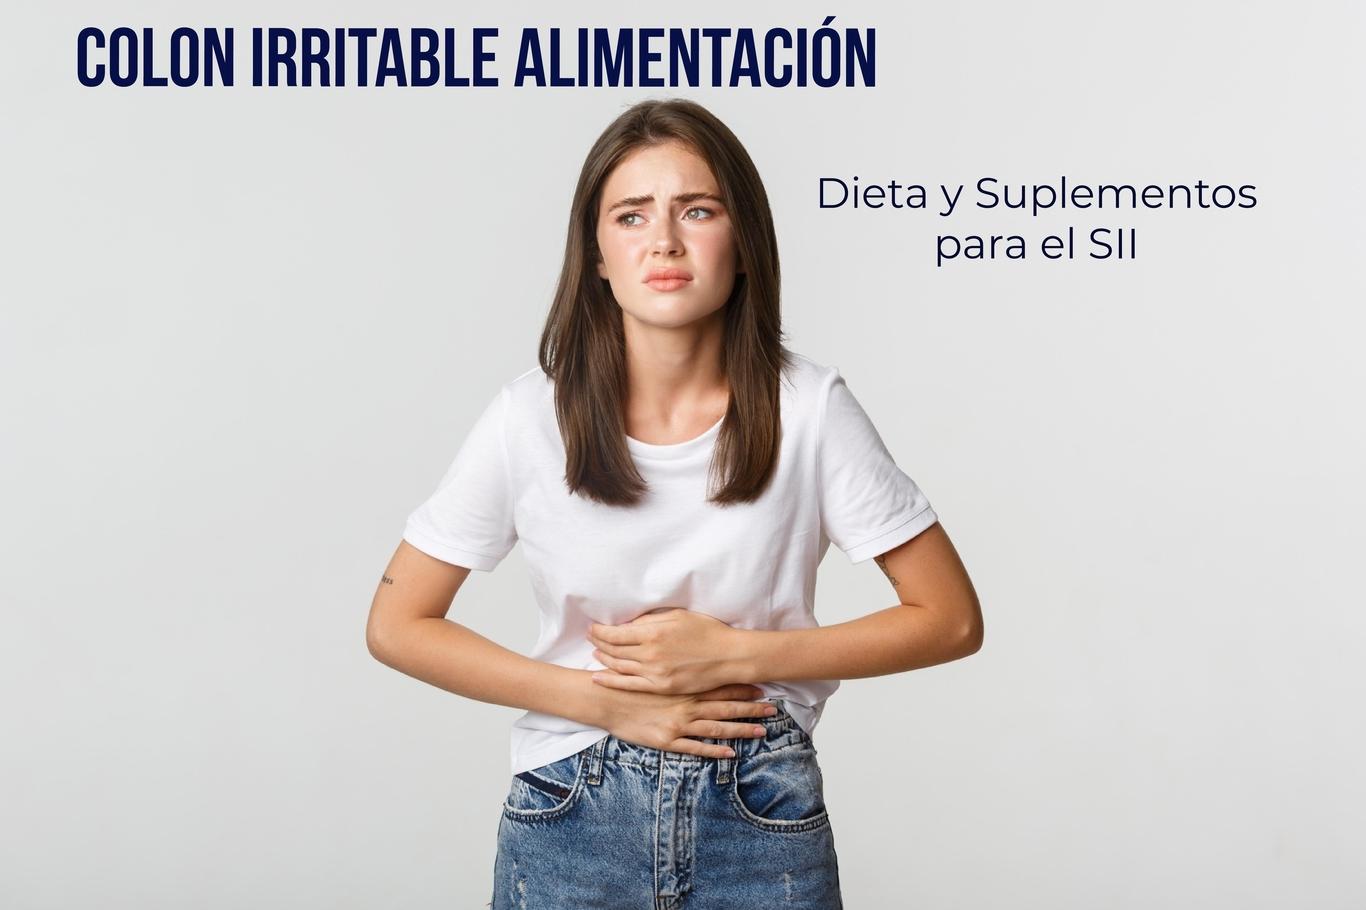 Colon Irritable Alimentacion